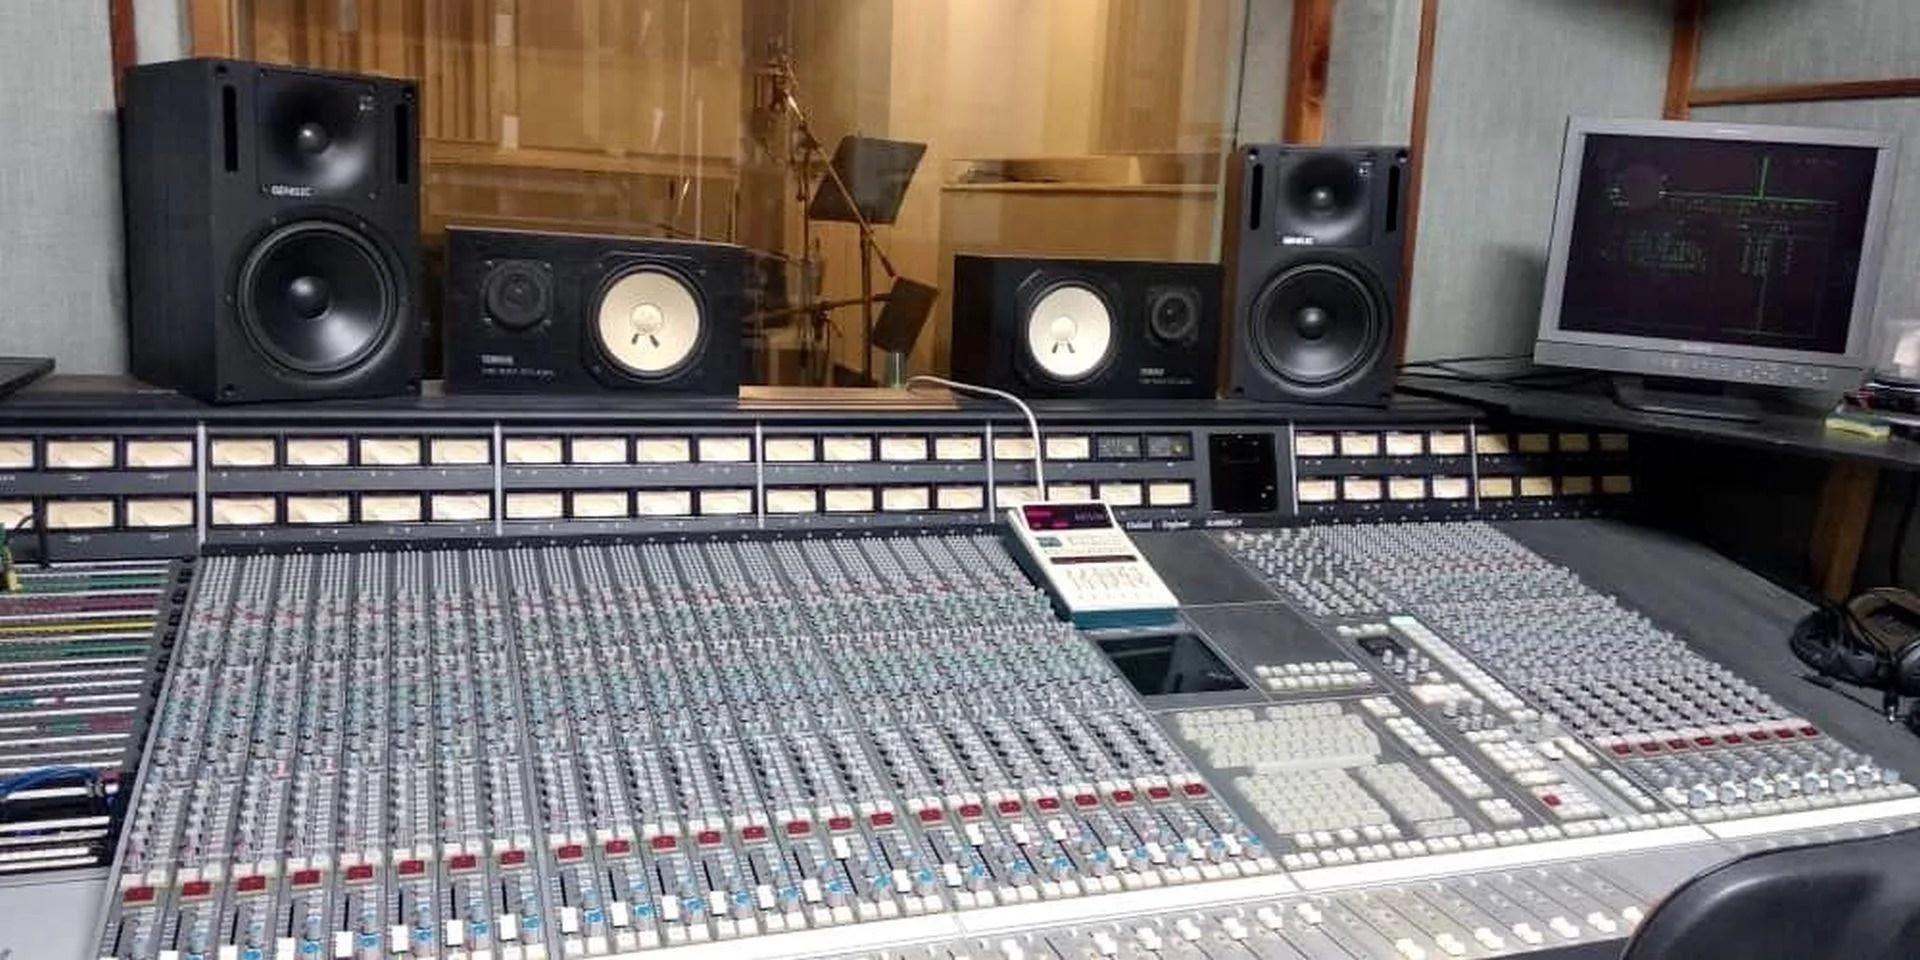 Recording studio Ojalá, by Silvio Rodríguez. Photo: Courtesy of Studies Hopefully.